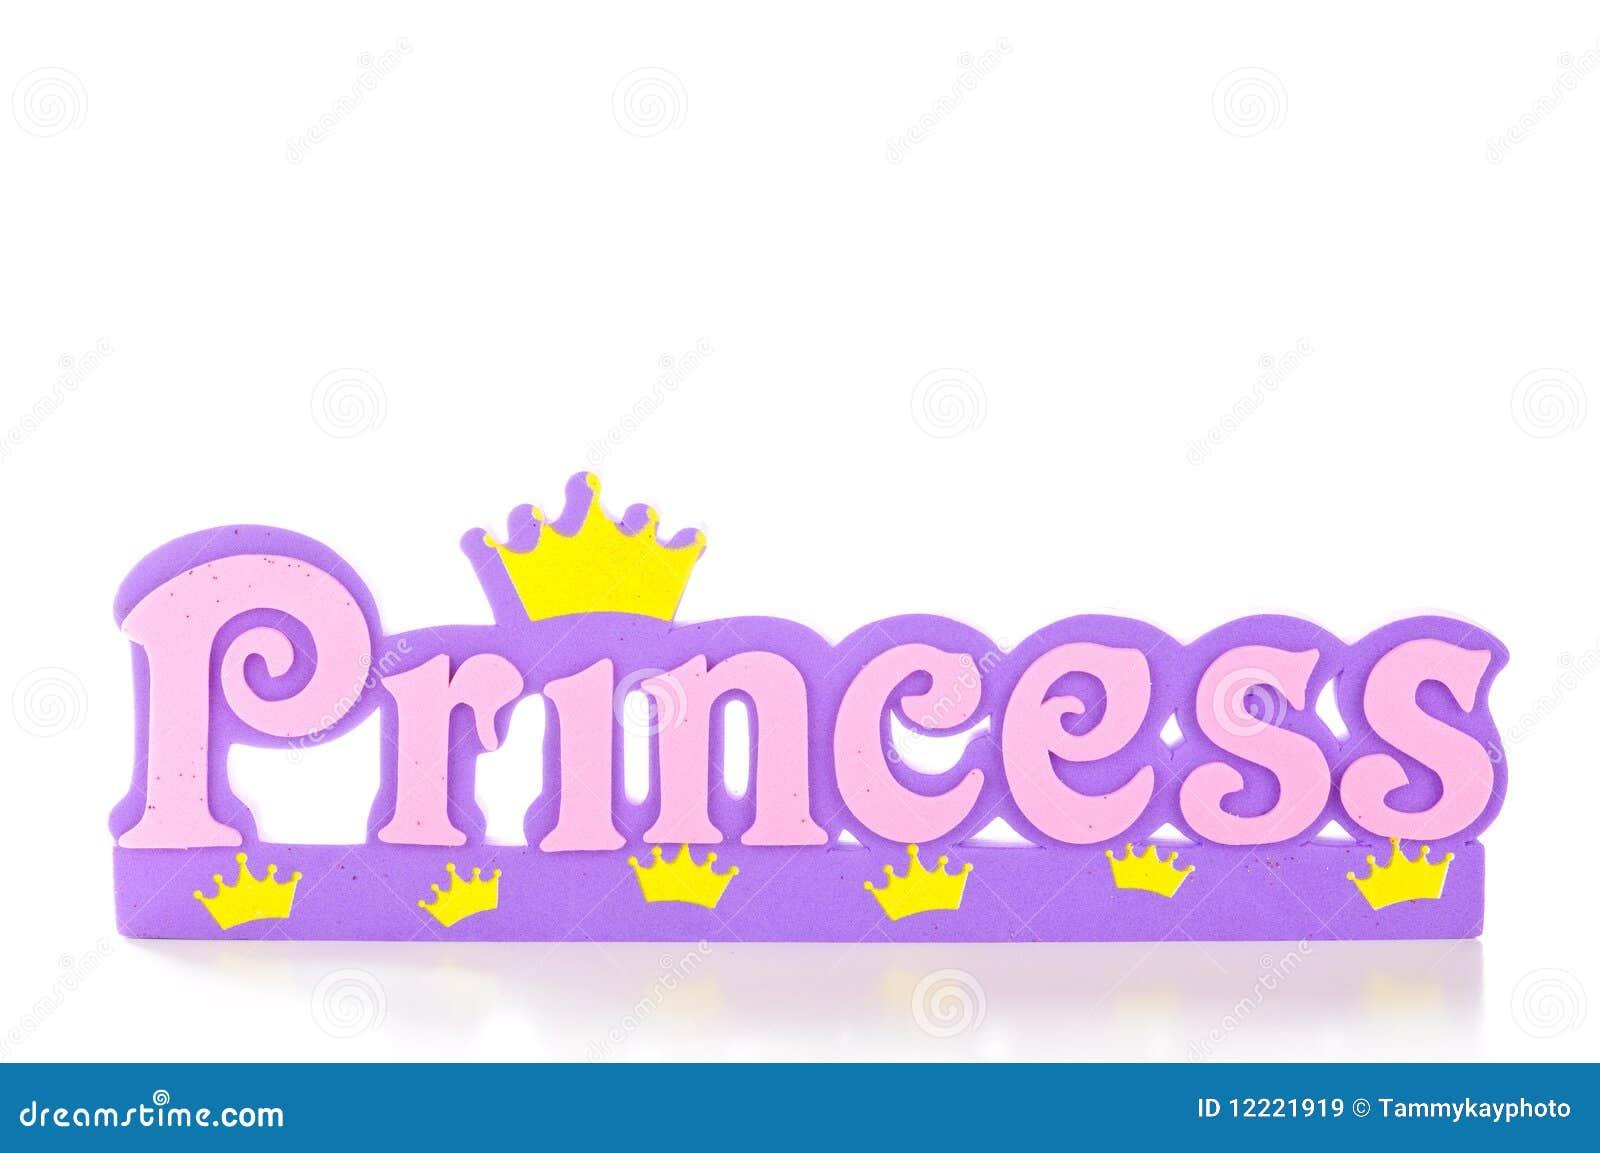 Princess Frame Royalty Free Stock Images - Image: 12221919